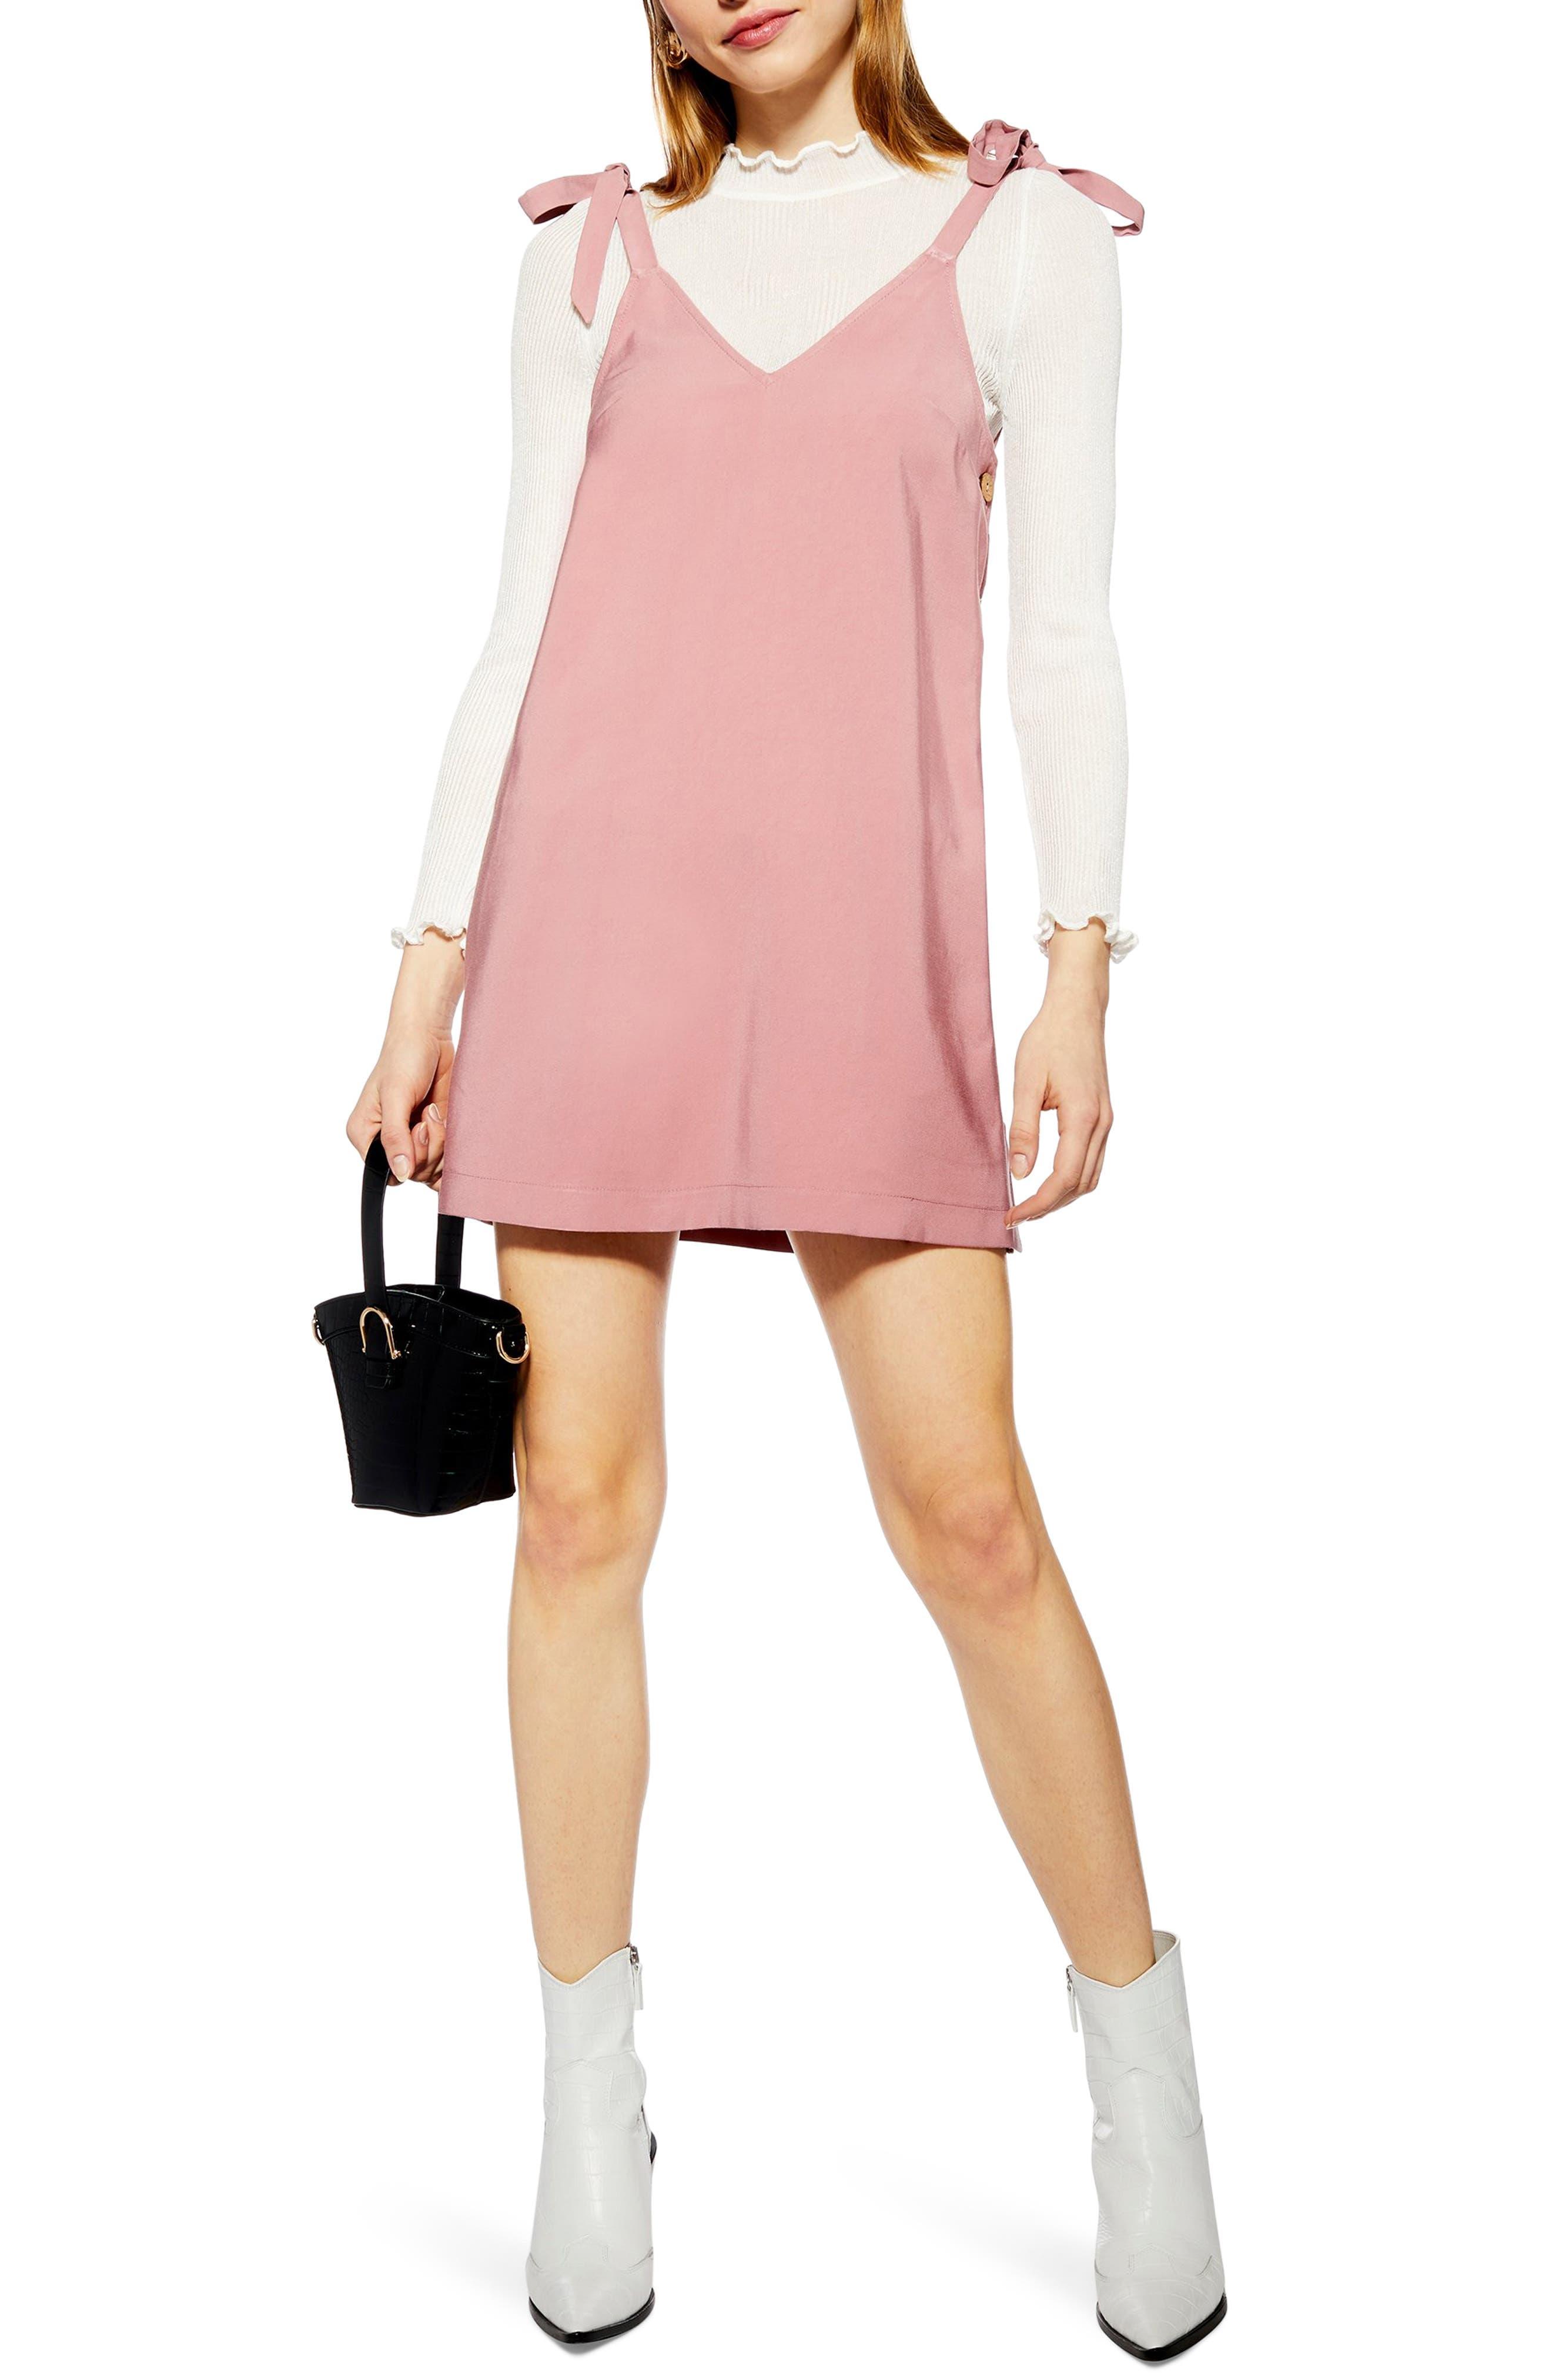 Topshop Tilda Button Mini Slipdress, US (fits like 14) - Pink